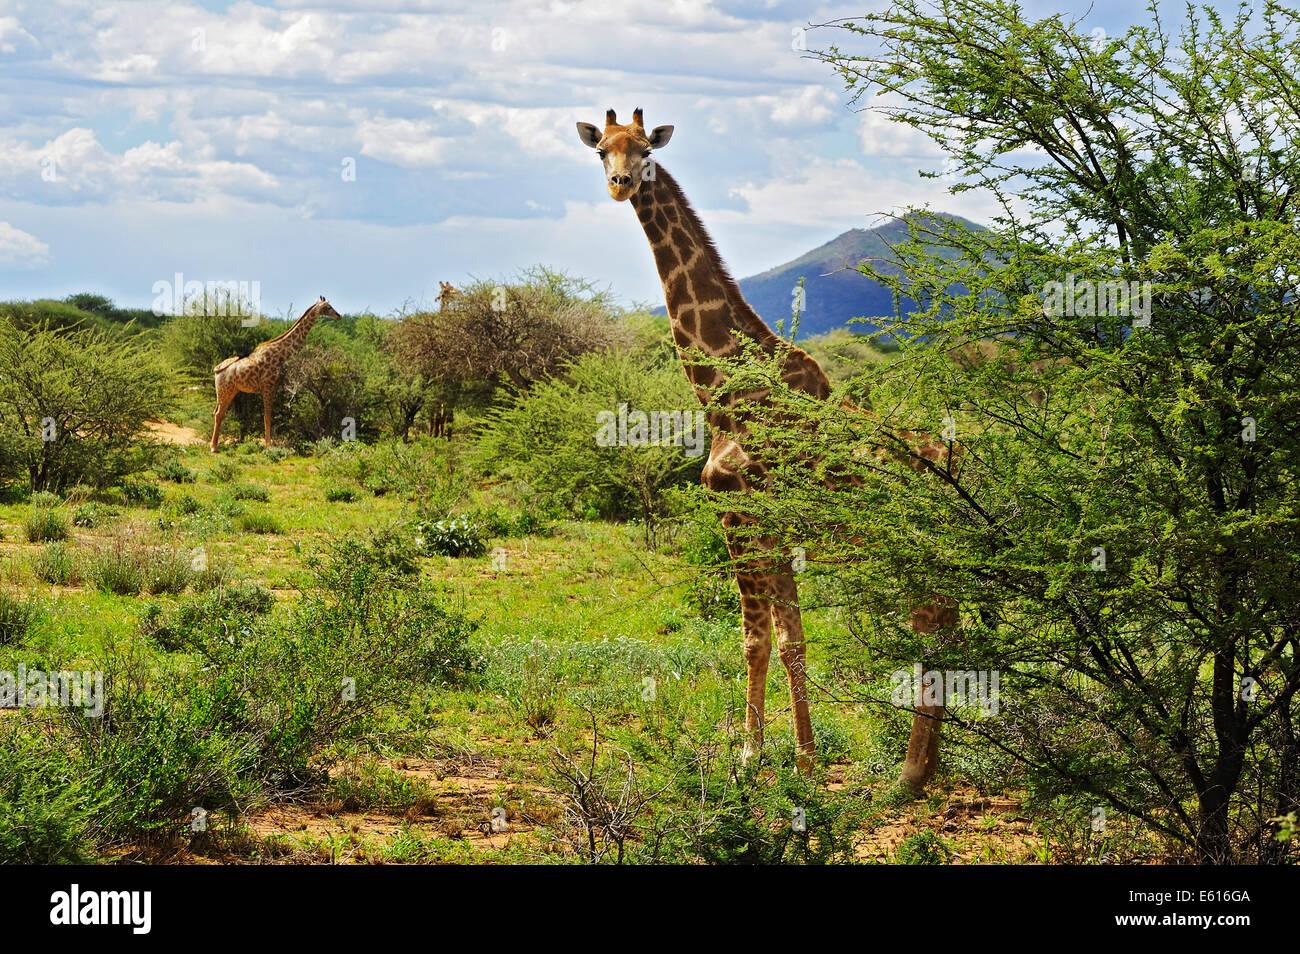 Savannah avec girafes (Giraffa camelopardalis) à Okahandja, Namibie Photo Stock